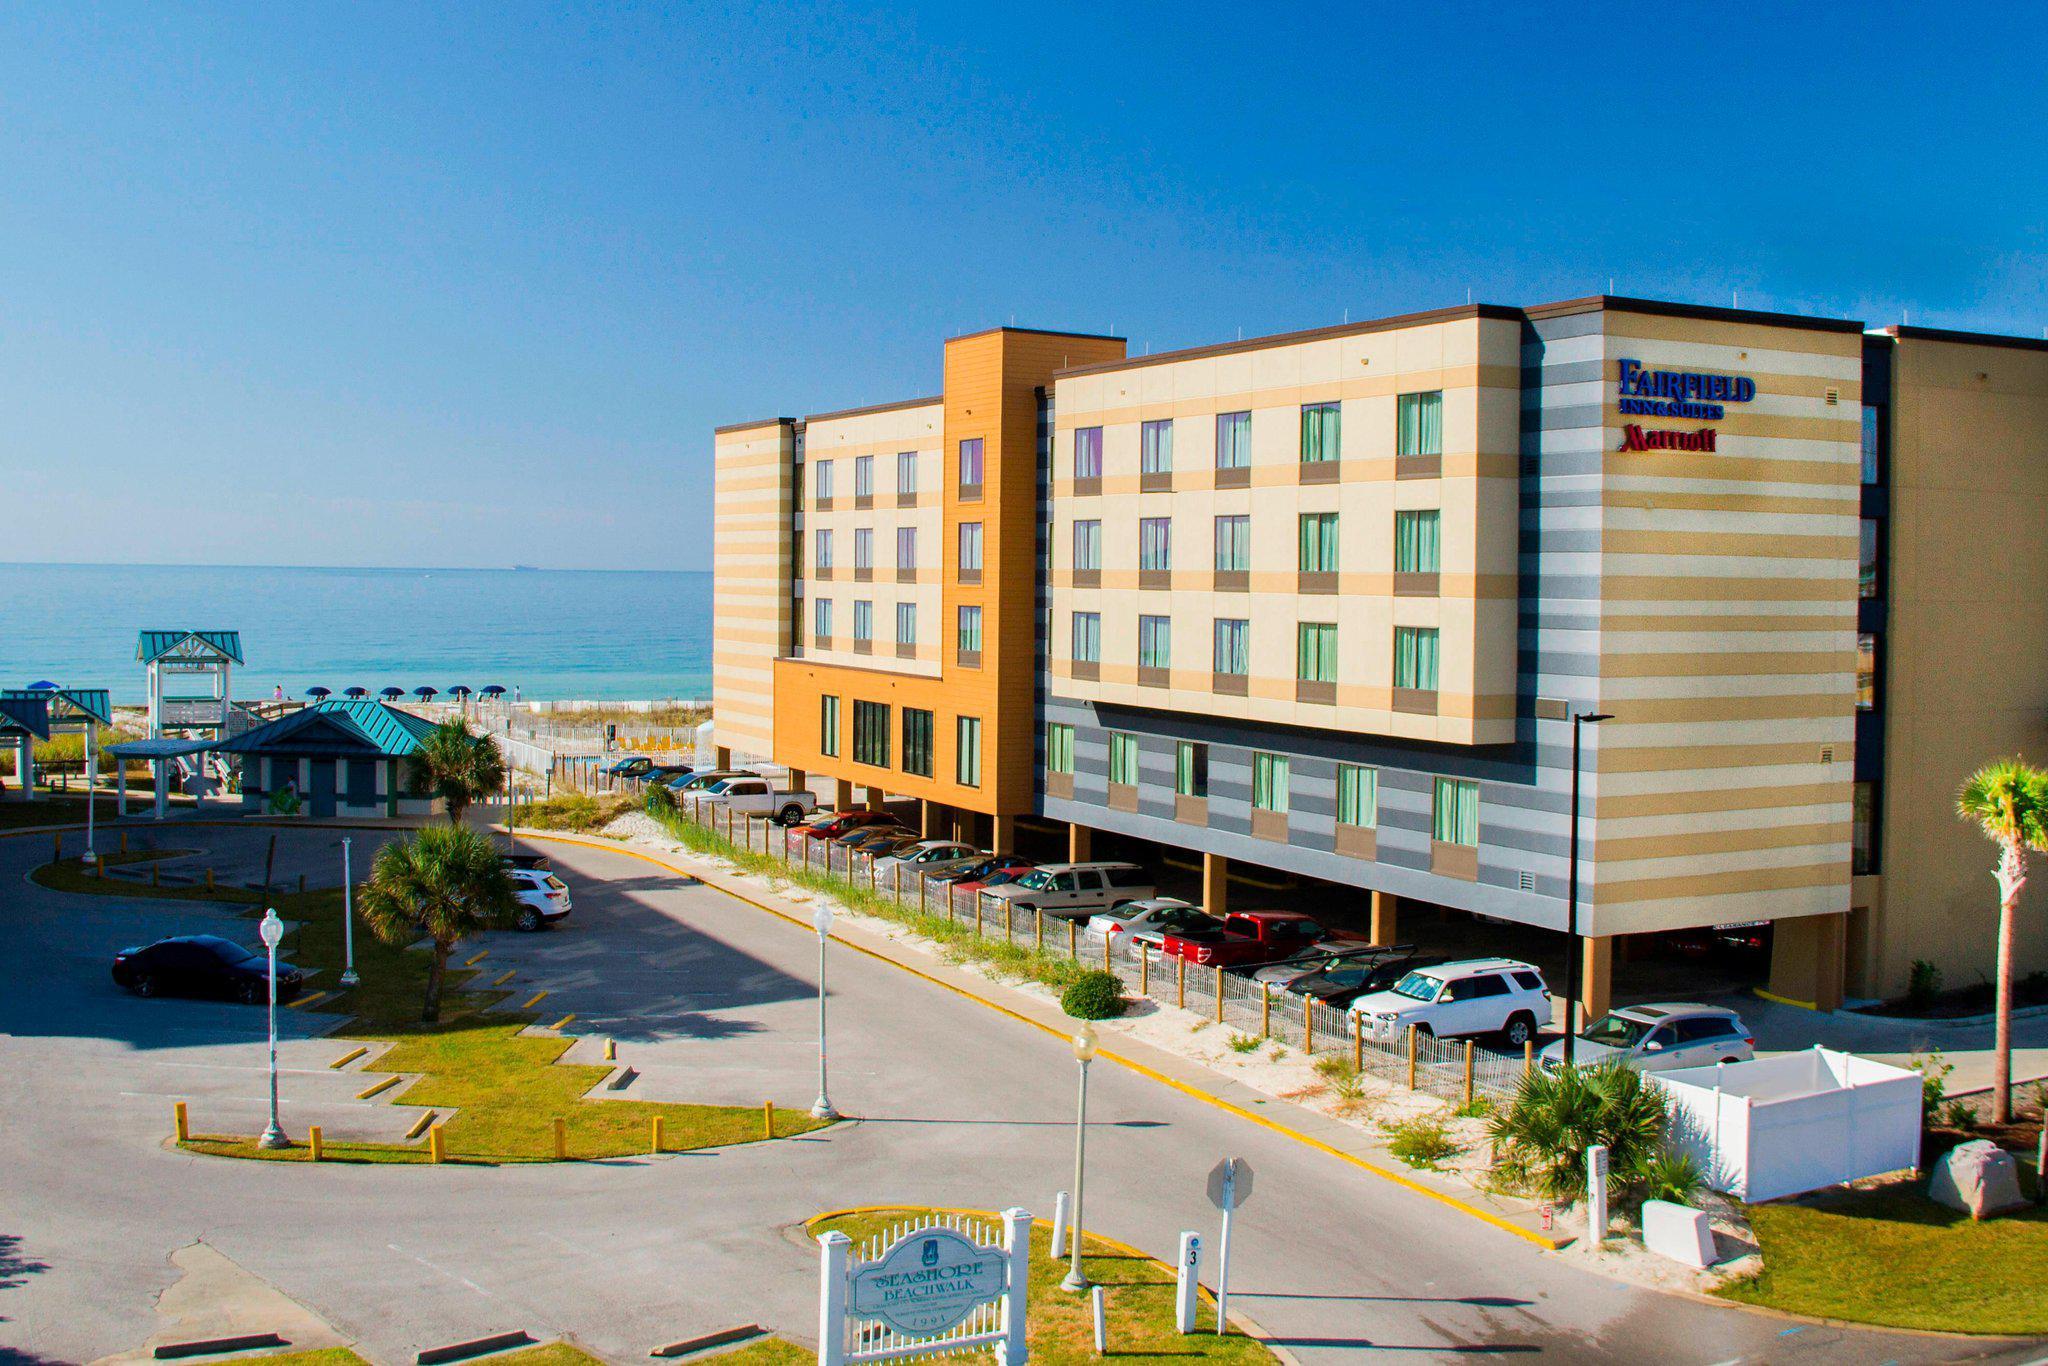 Fairfield Inn & Suites by Marriott Fort Walton Beach-West Destin